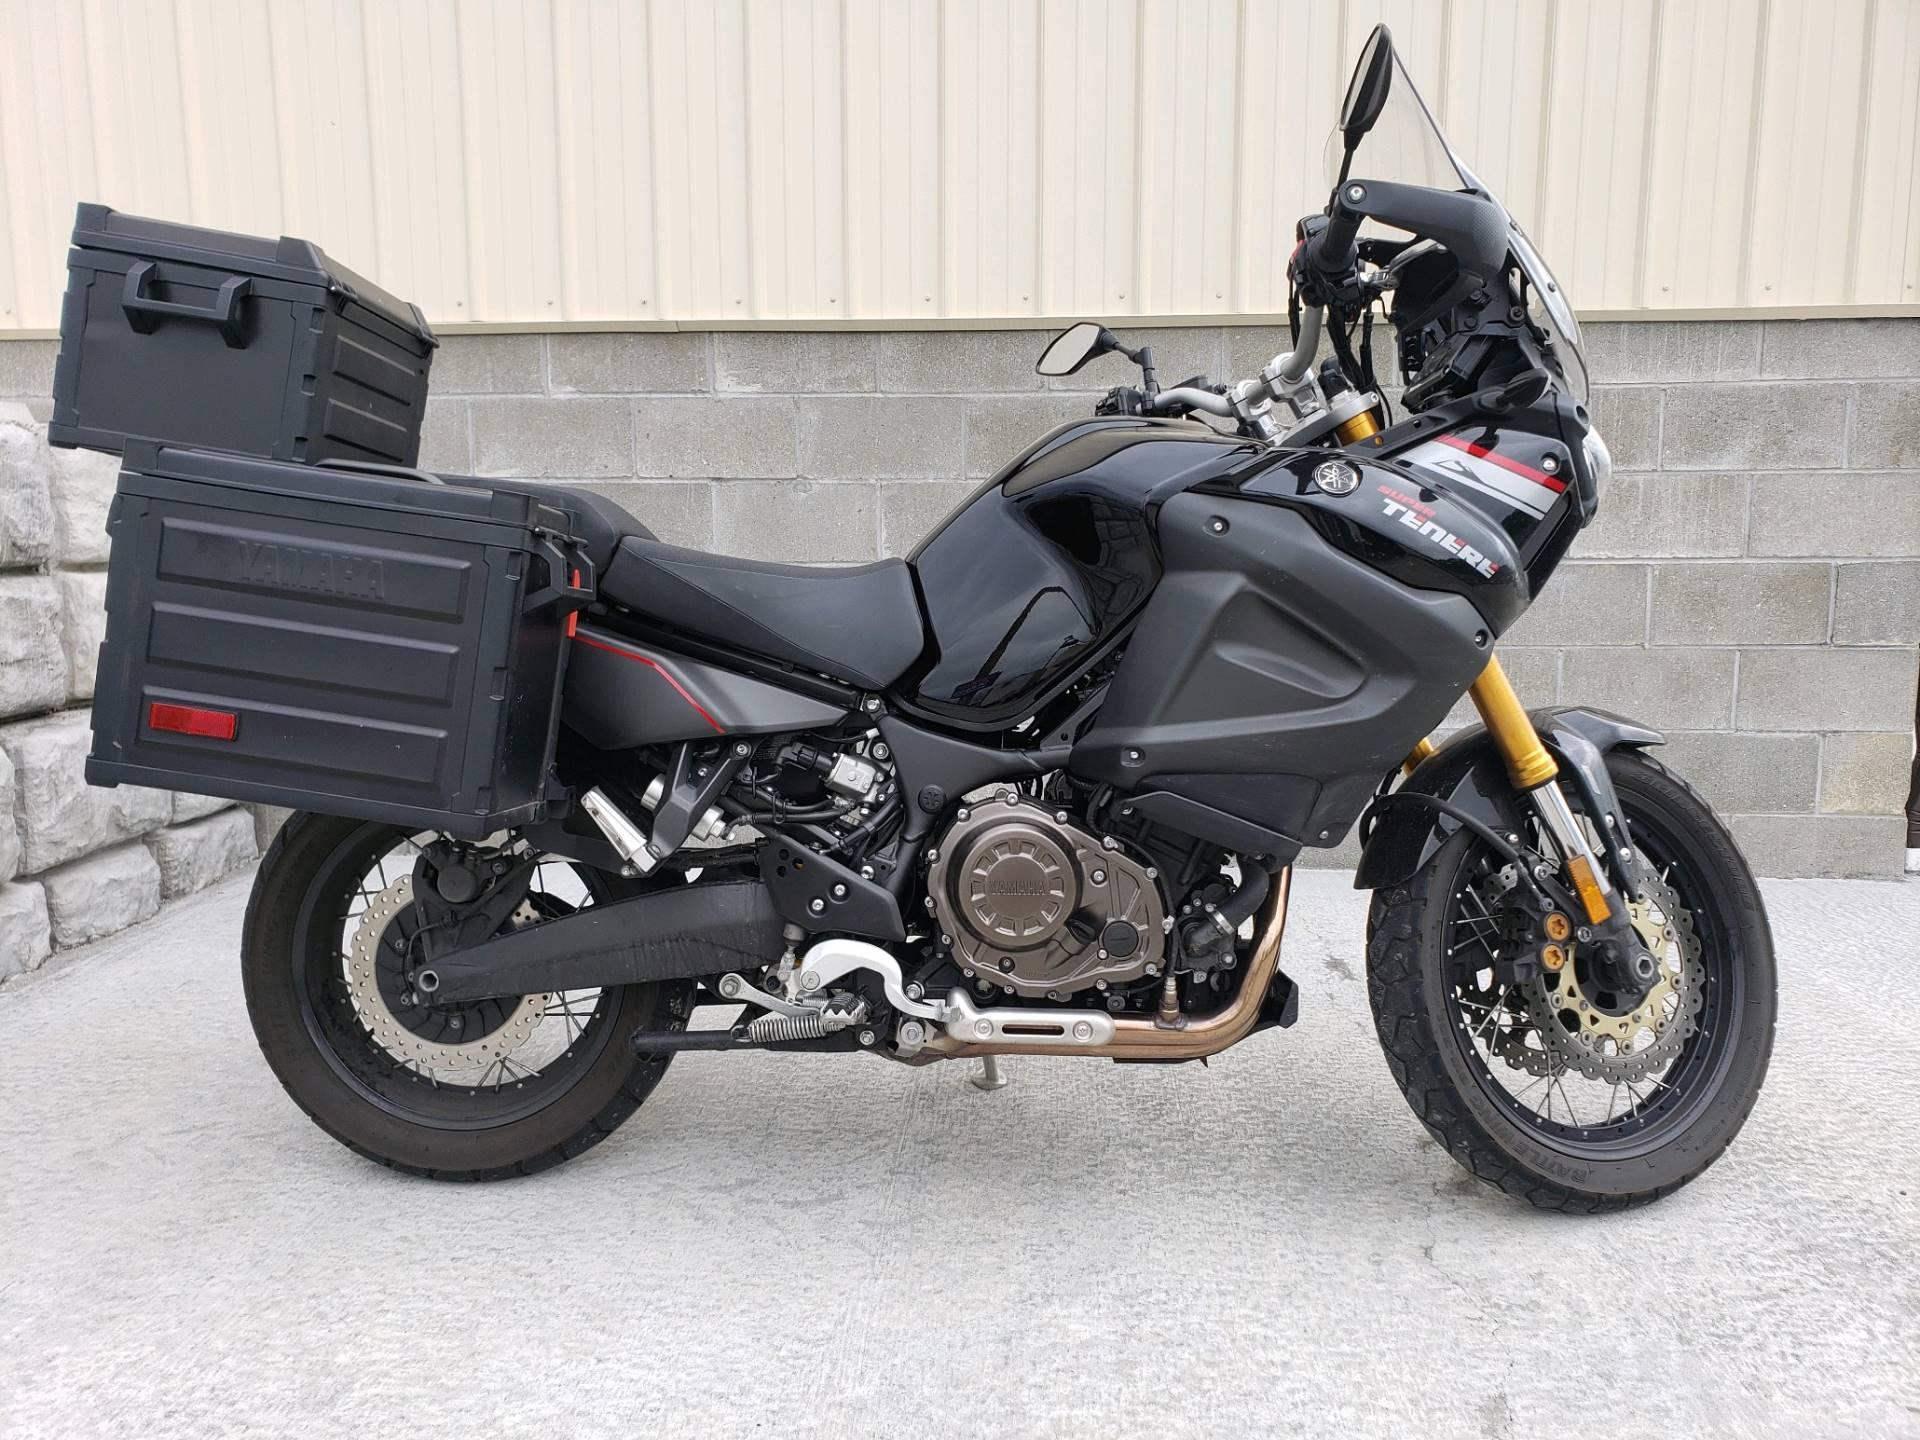 2016 Yamaha Super Tenere ES for sale 180072